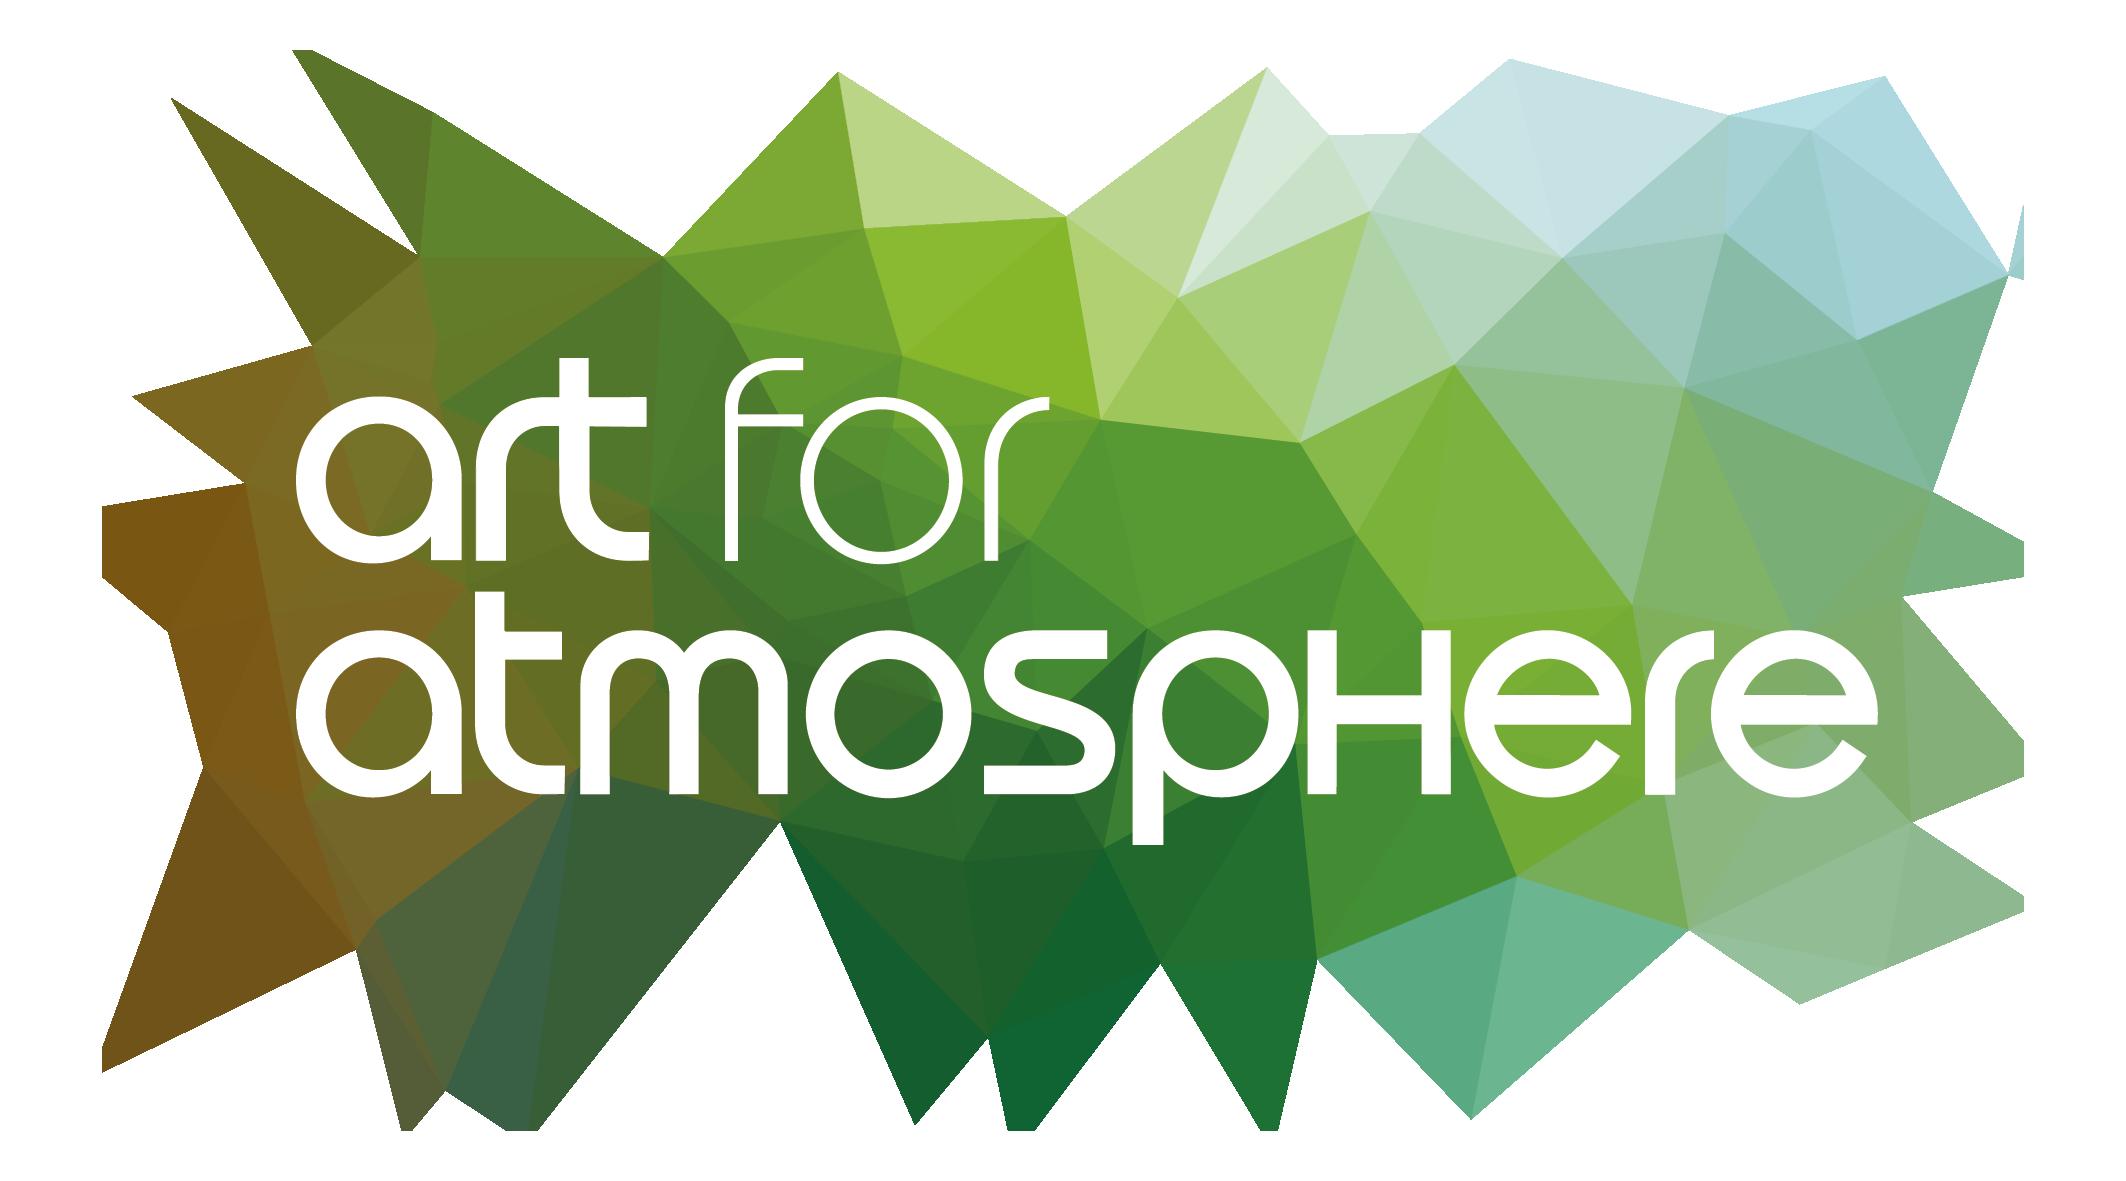 ArtforAtmosphere